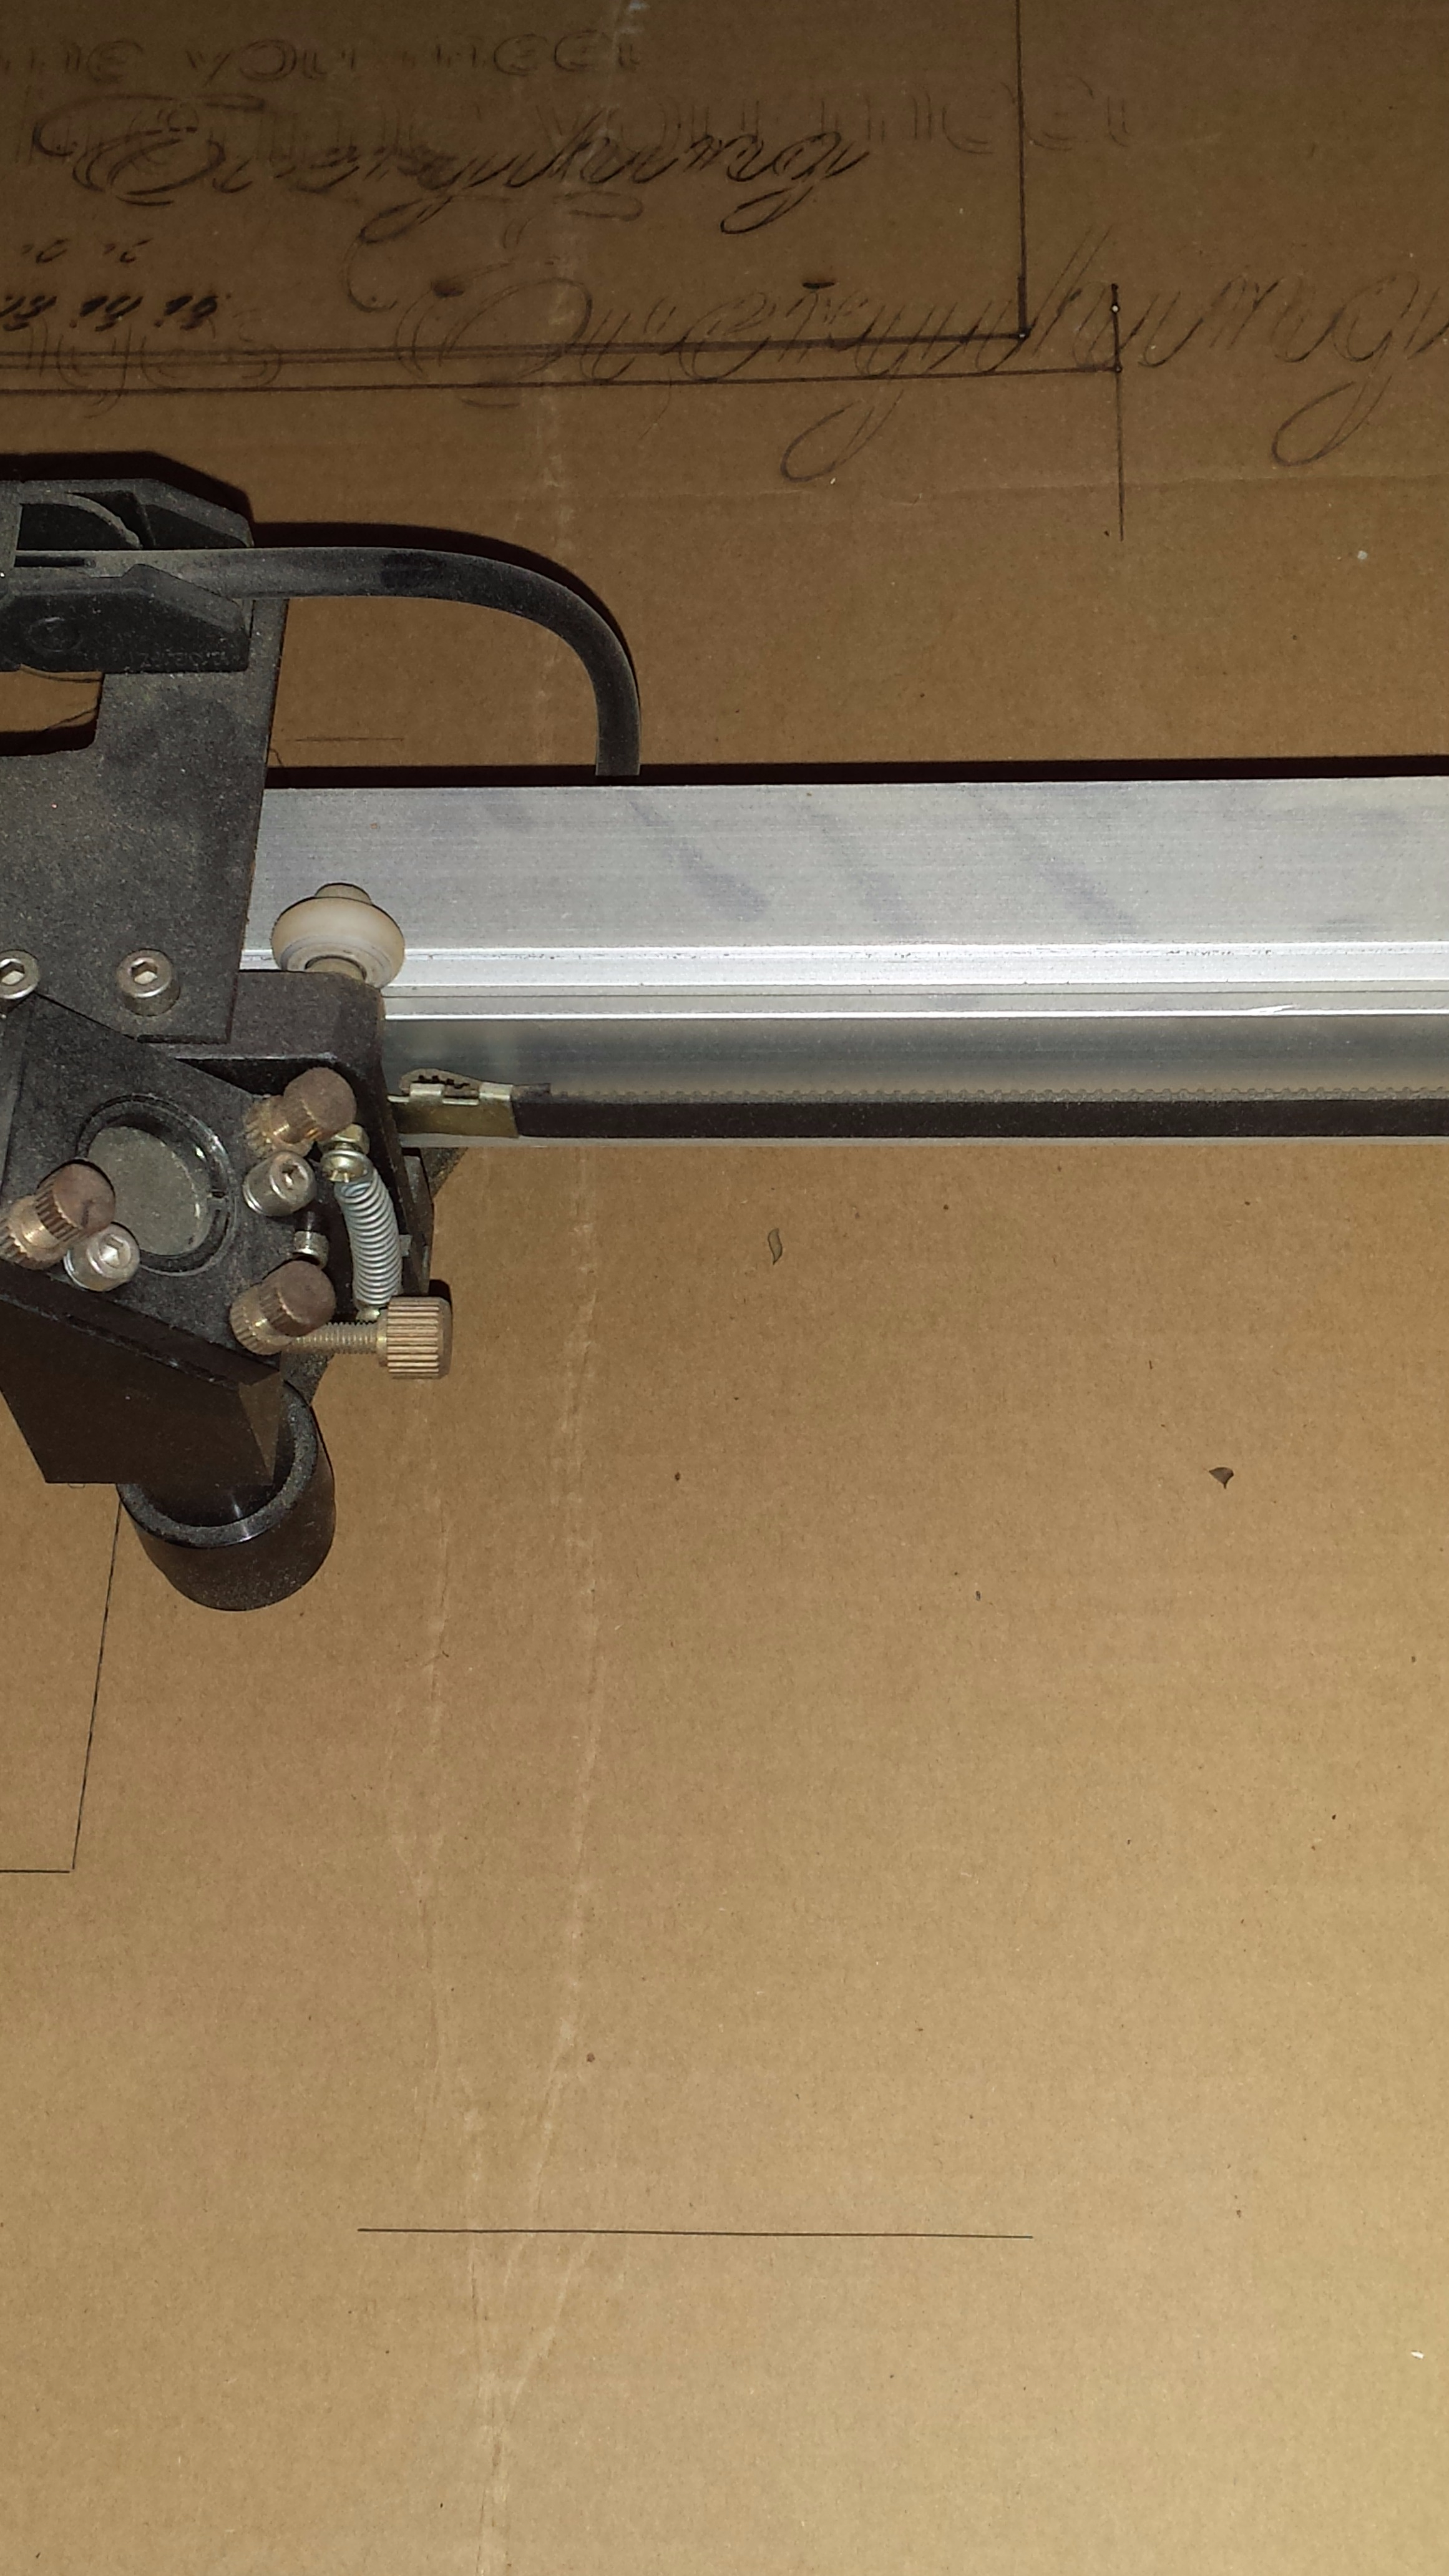 Picture of Cardboard Uses in My Workshop -- Laser Engraving